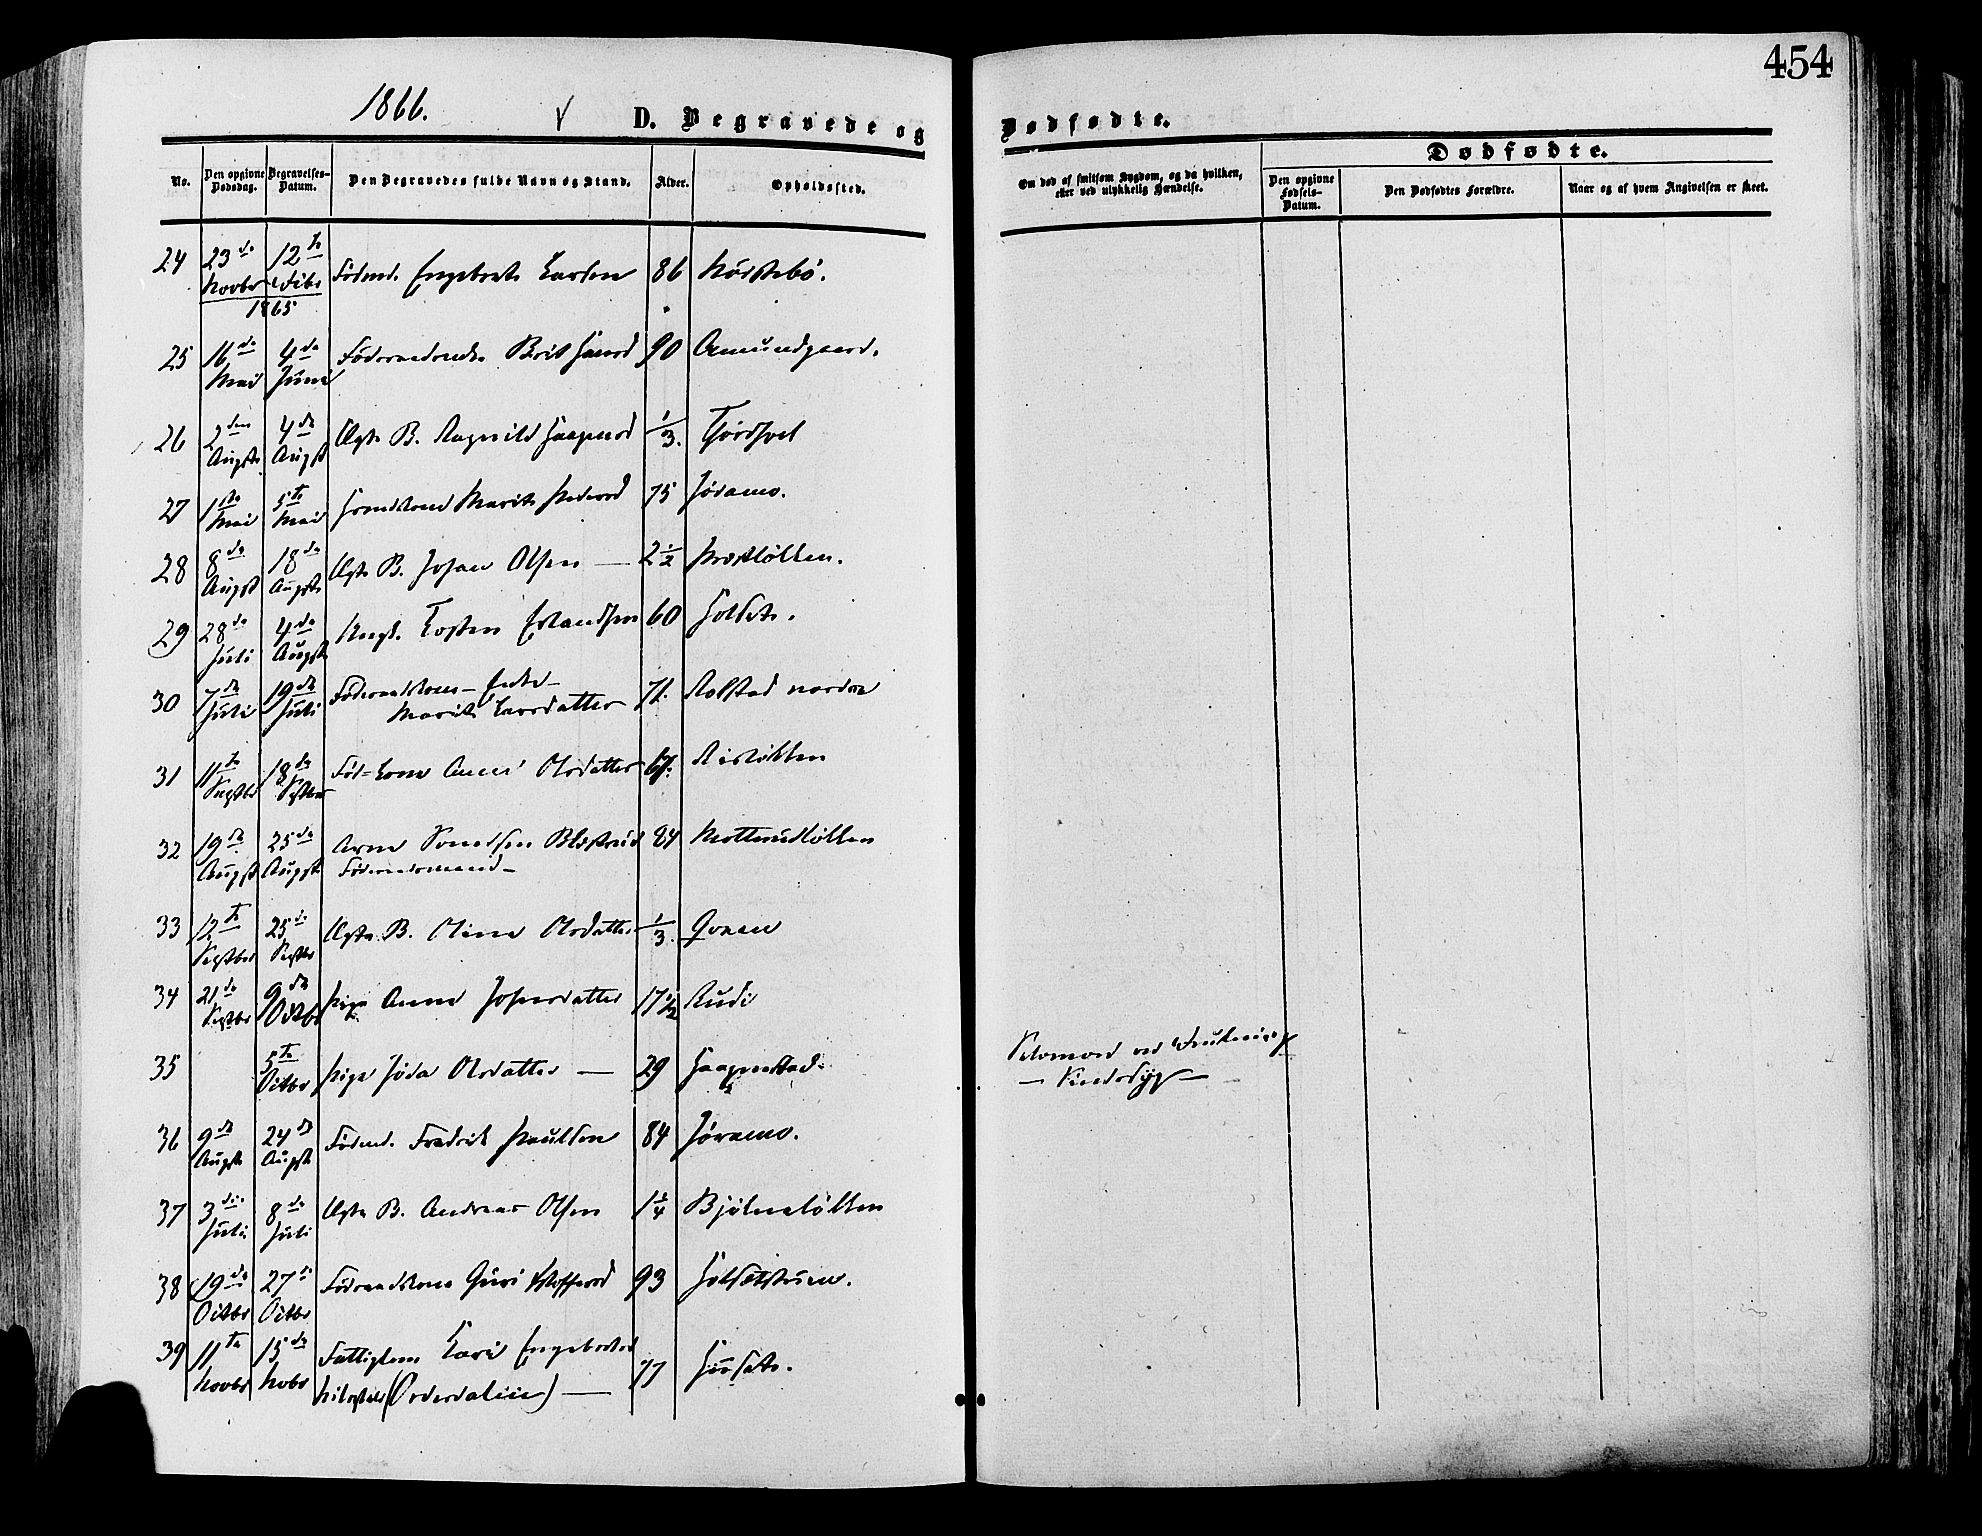 SAH, Lesja prestekontor, Ministerialbok nr. 8, 1854-1880, s. 454